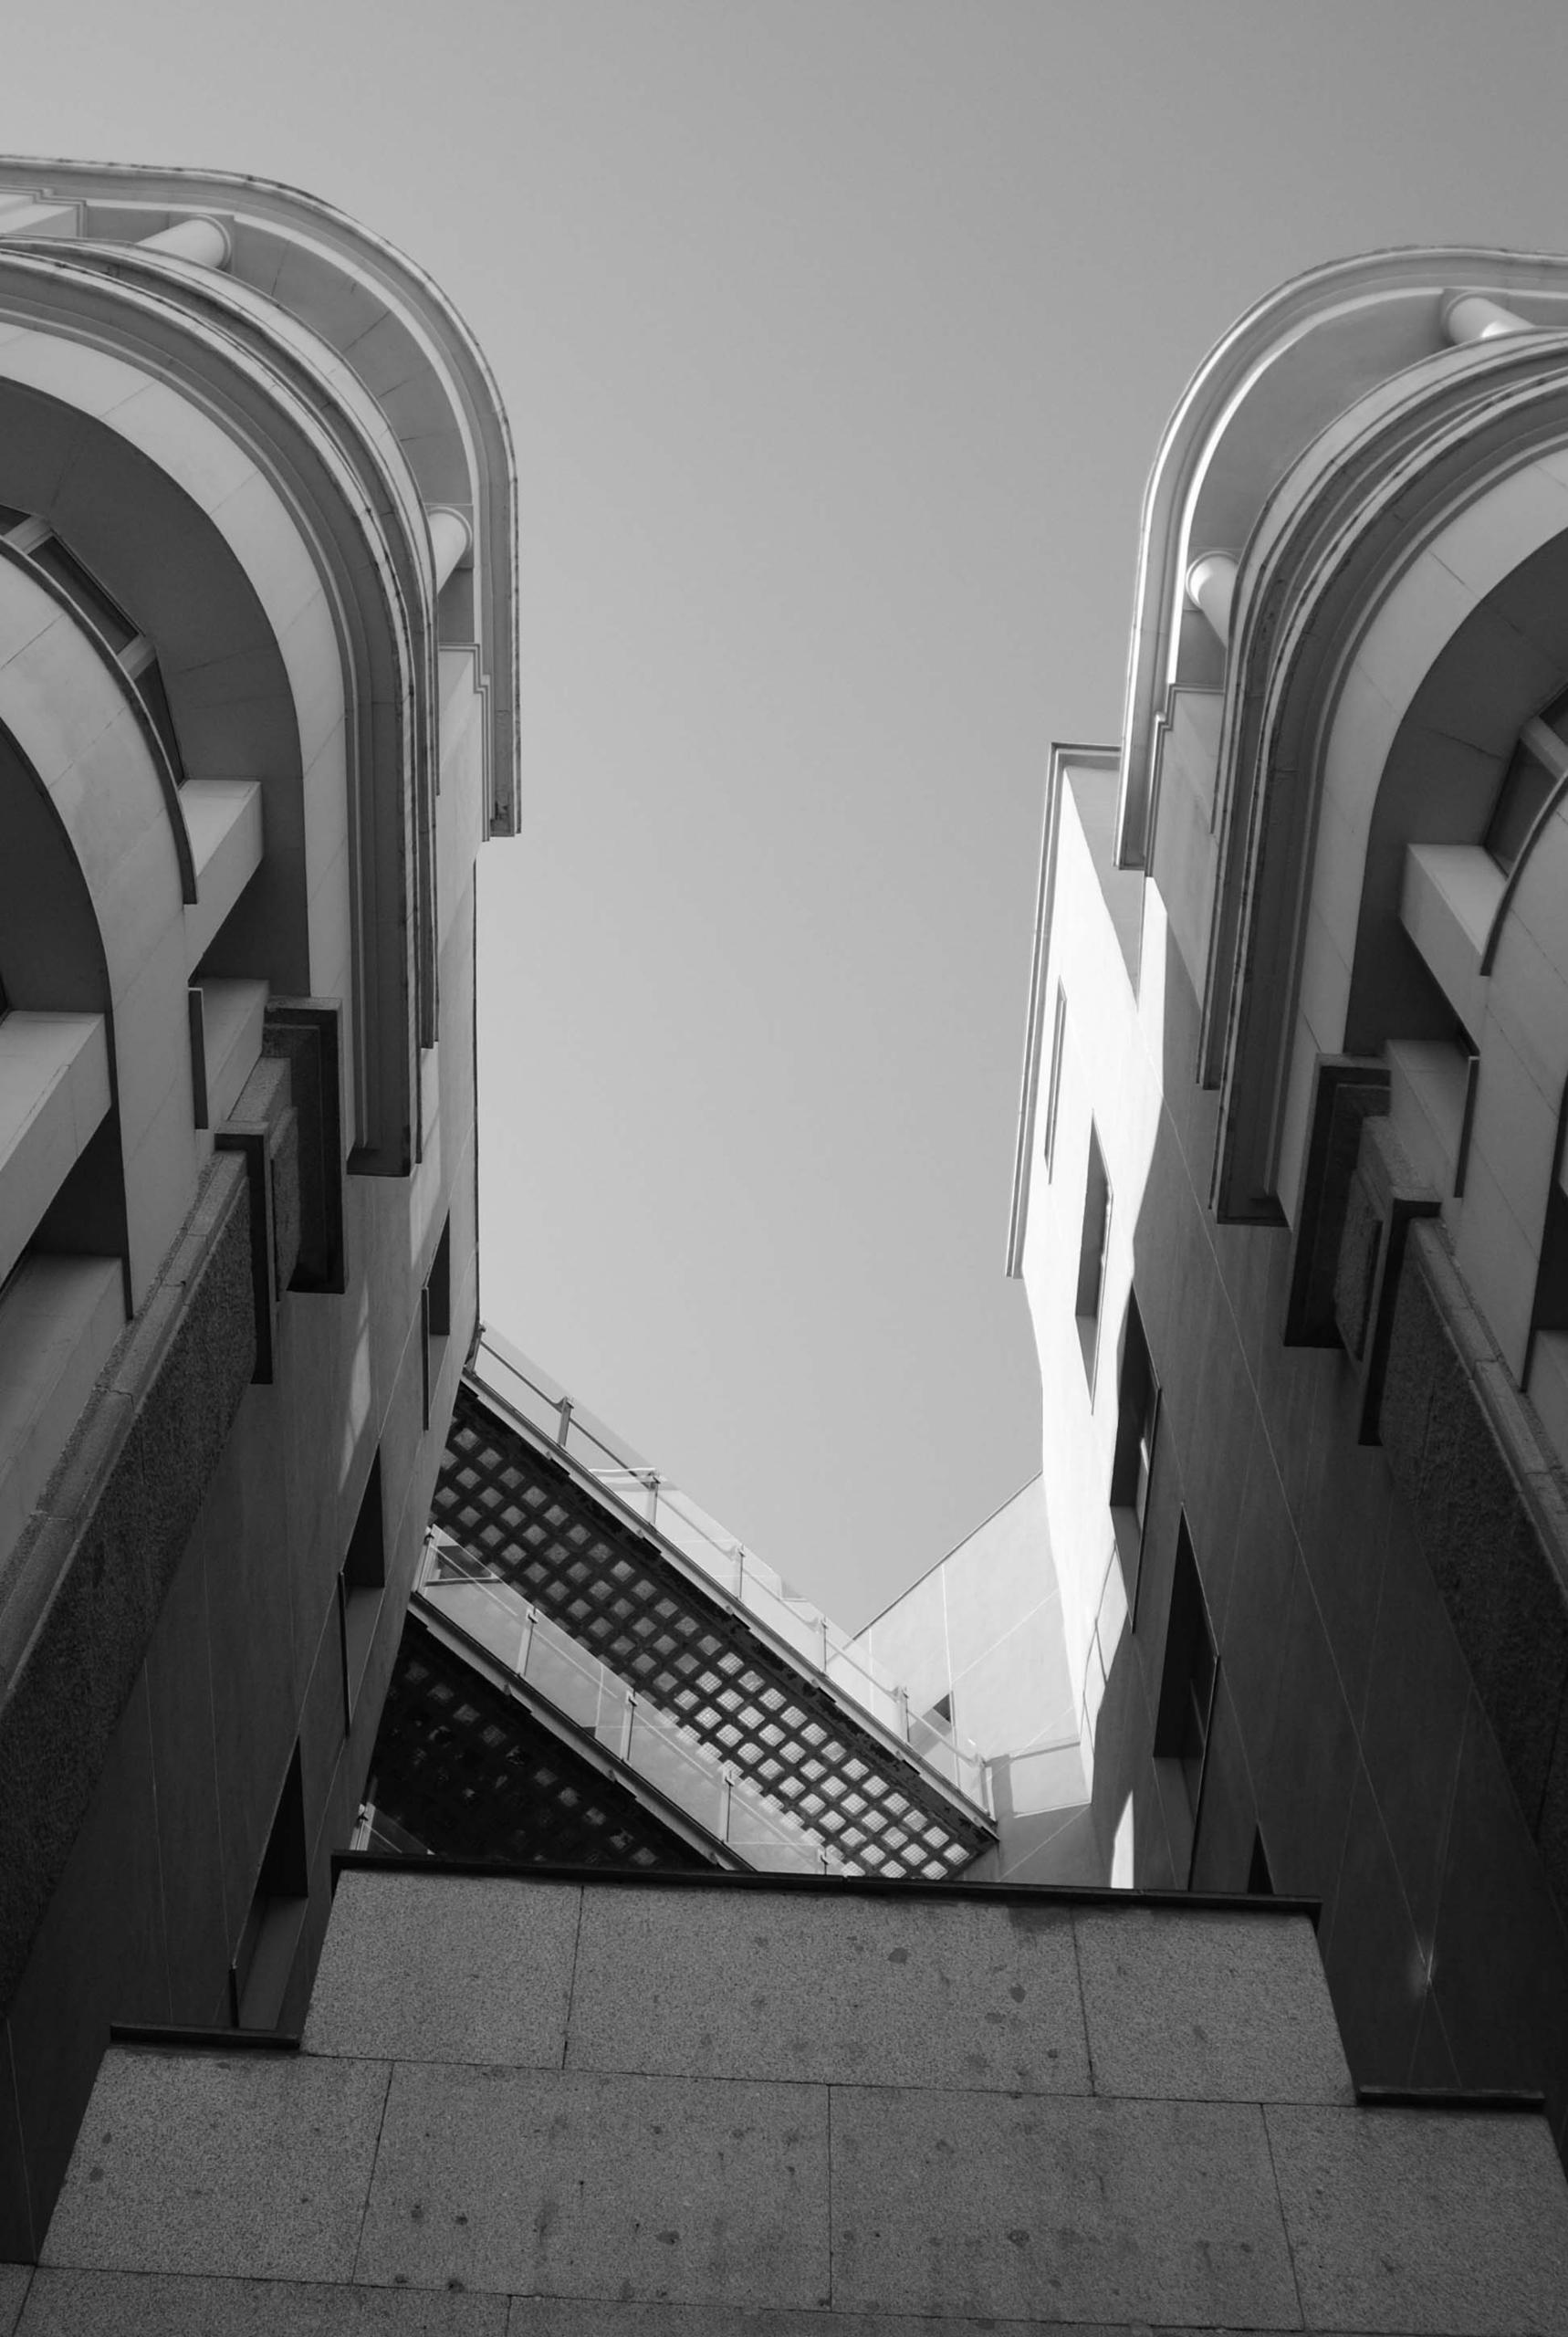 Black white - photography, bw, bw - kunstlinie21grad | ello